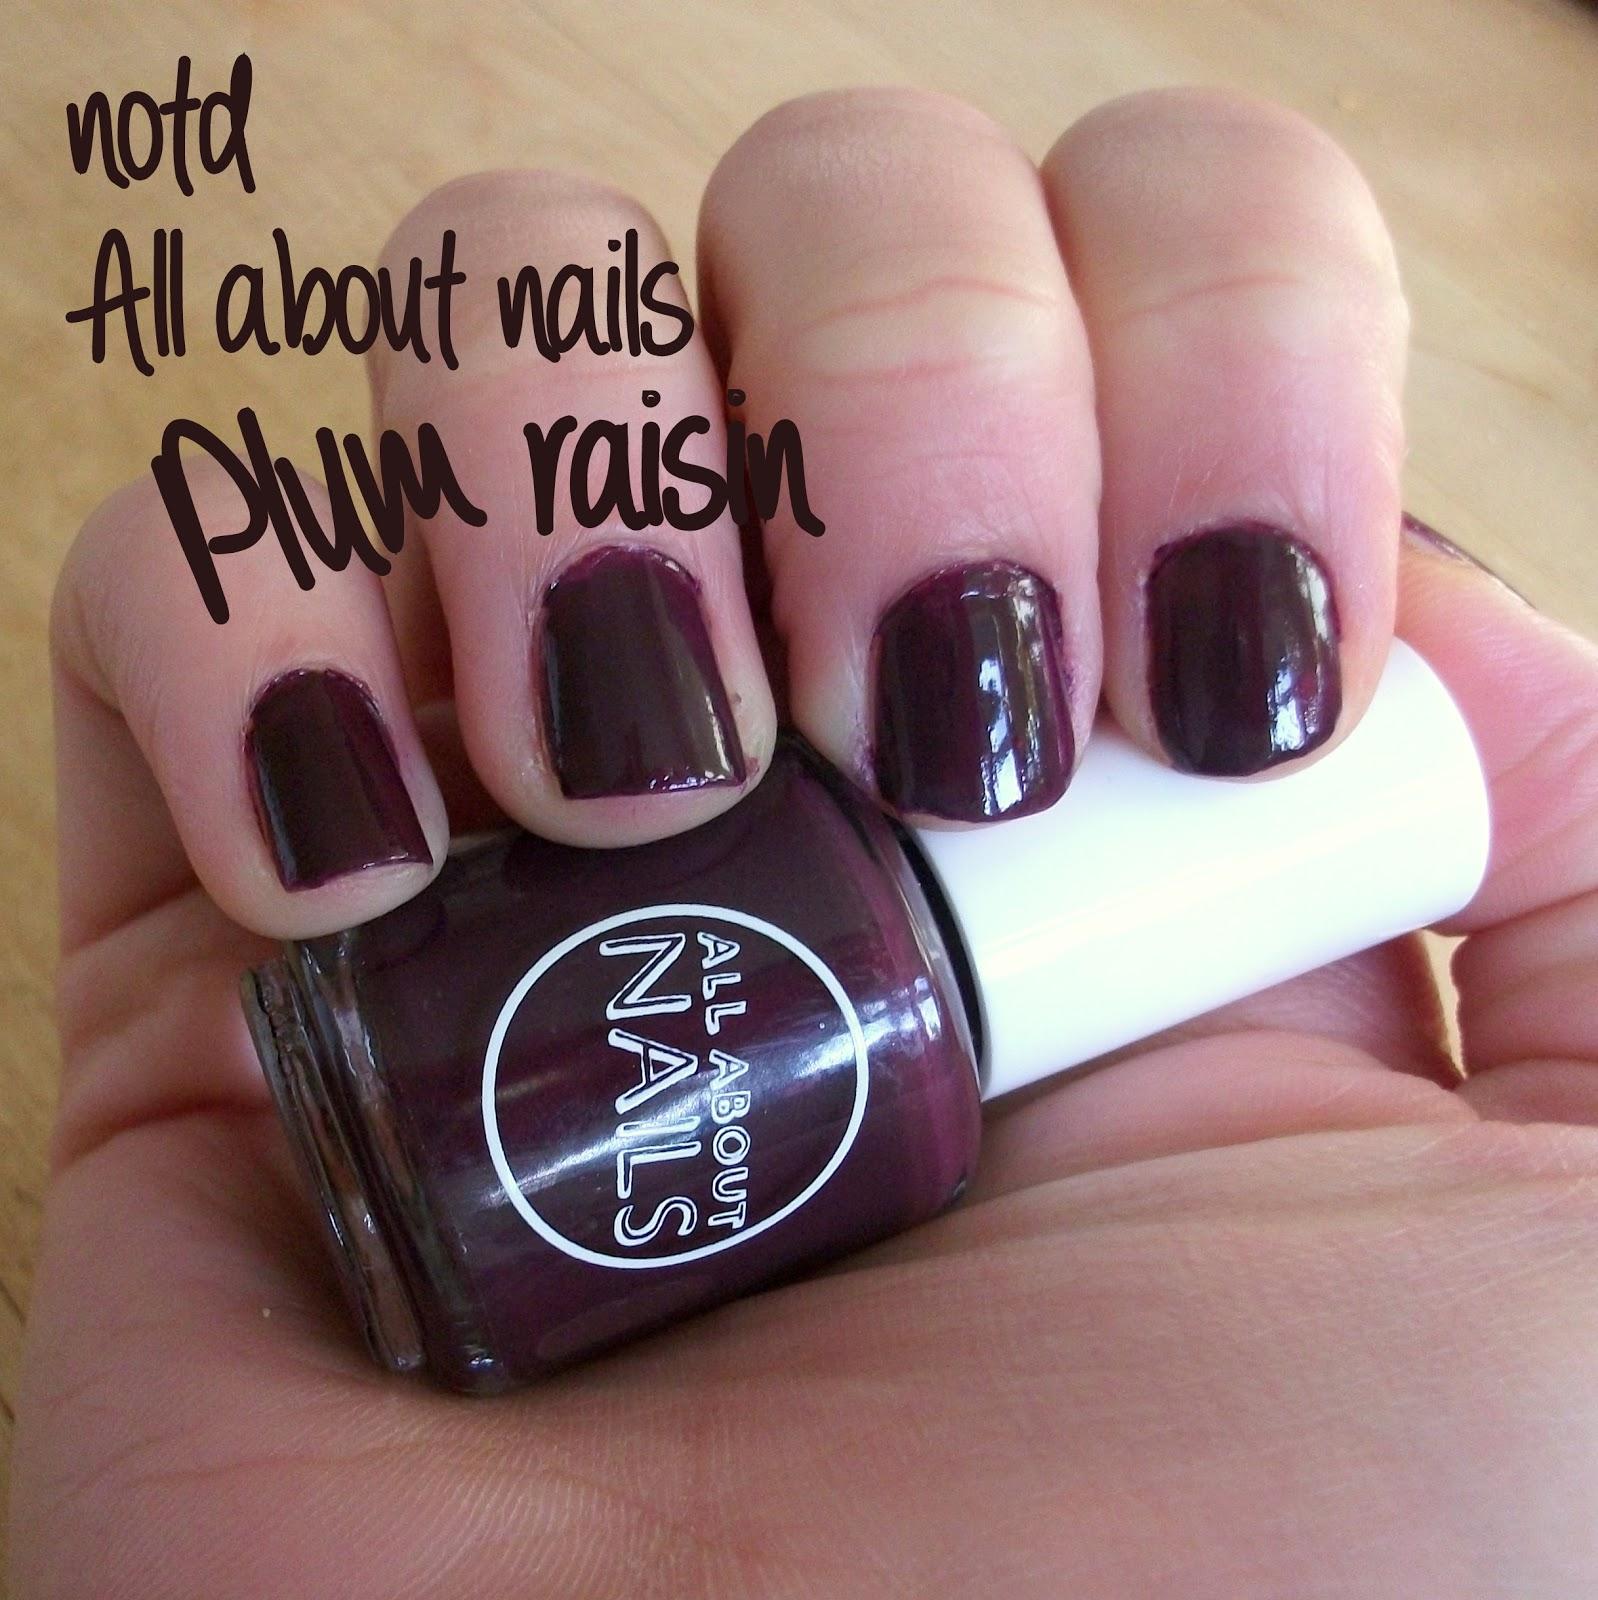 GemSeren UK Beauty Blog: NOTD: All About Nails (Tesco